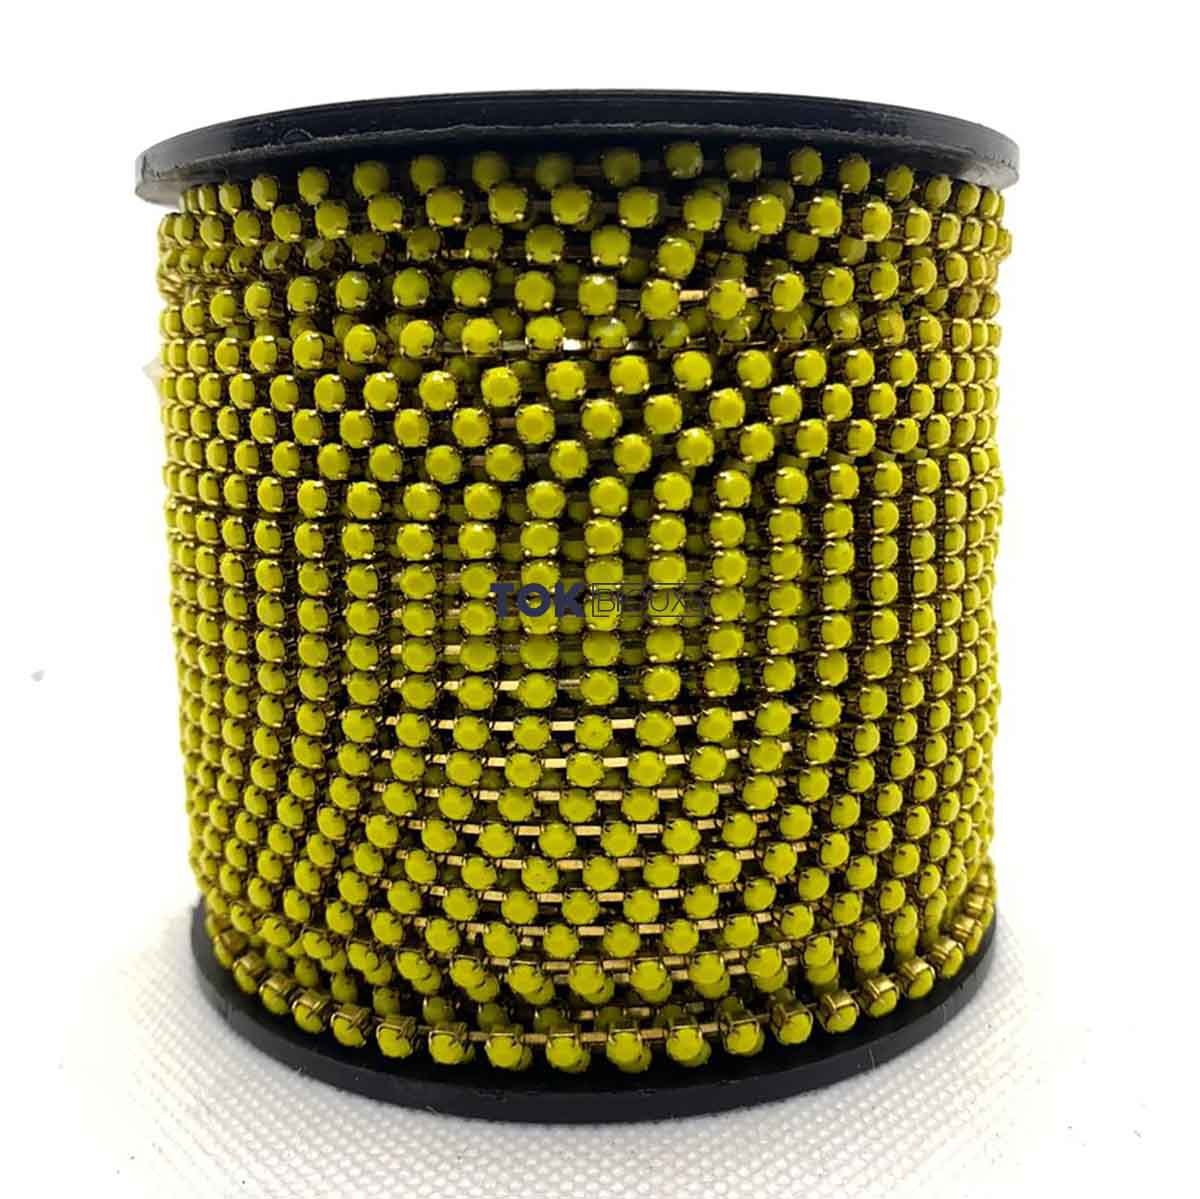 Atacado -  Corrente De Strass  SS12 - Corrente Dourado C/ Cristal Amarelo Leitoso - 50m